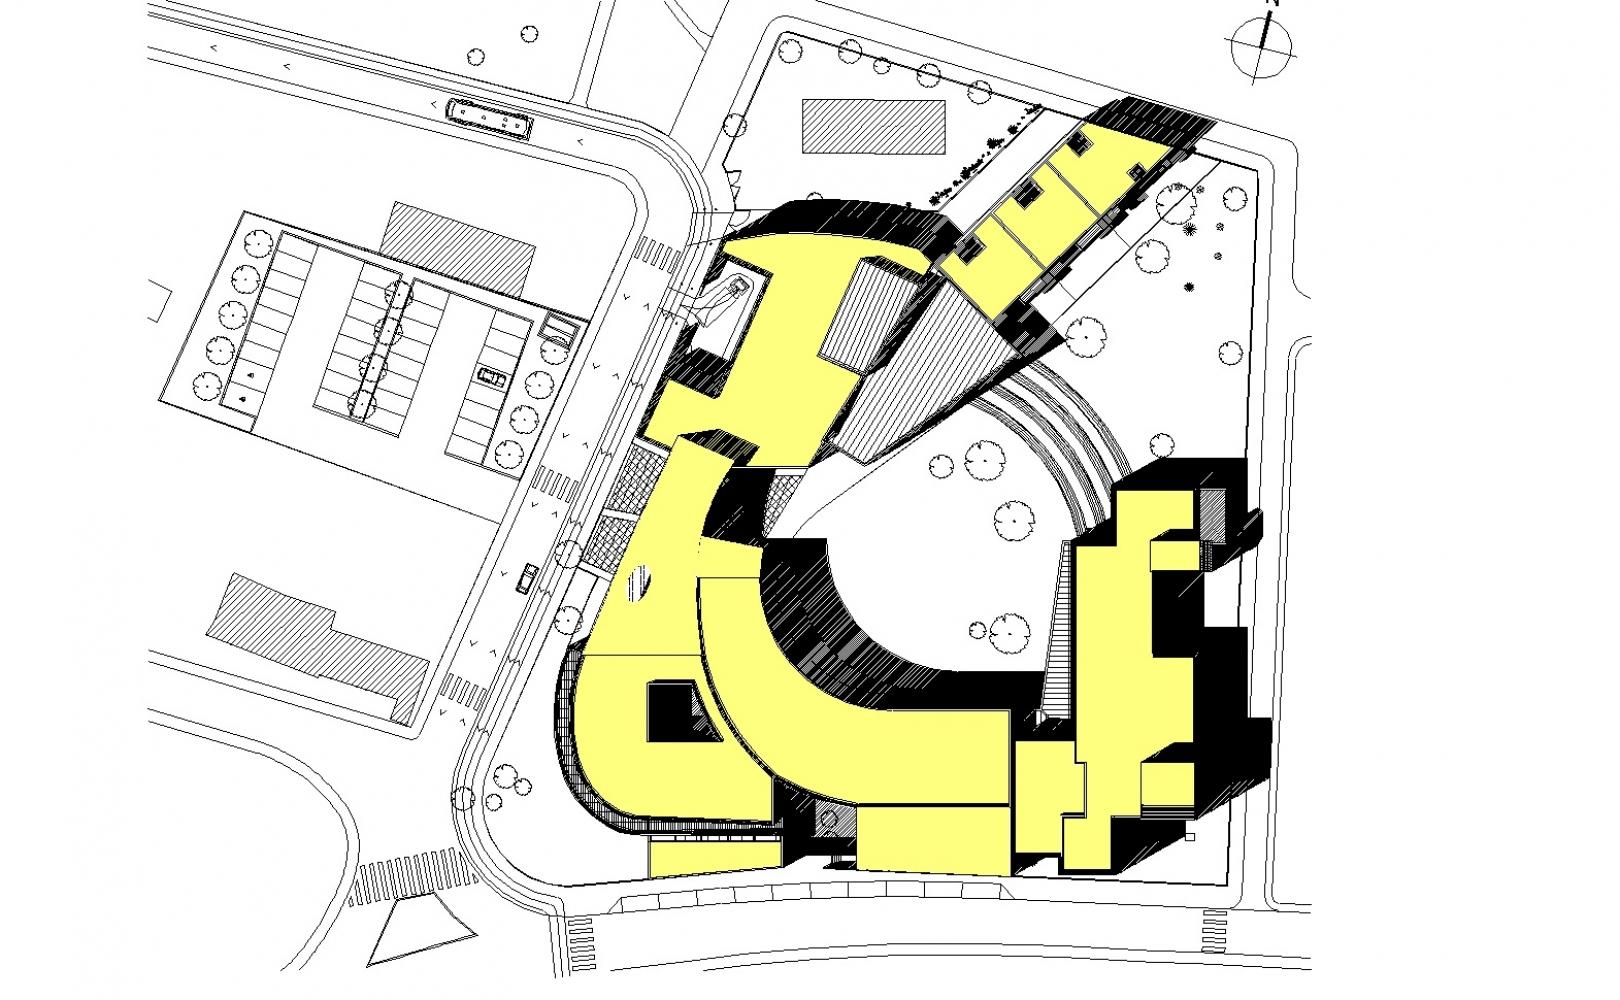 10-neuvy-le-roi-img-002 Pascale SEURIN Architecte - Pascale SEURIN Architecte